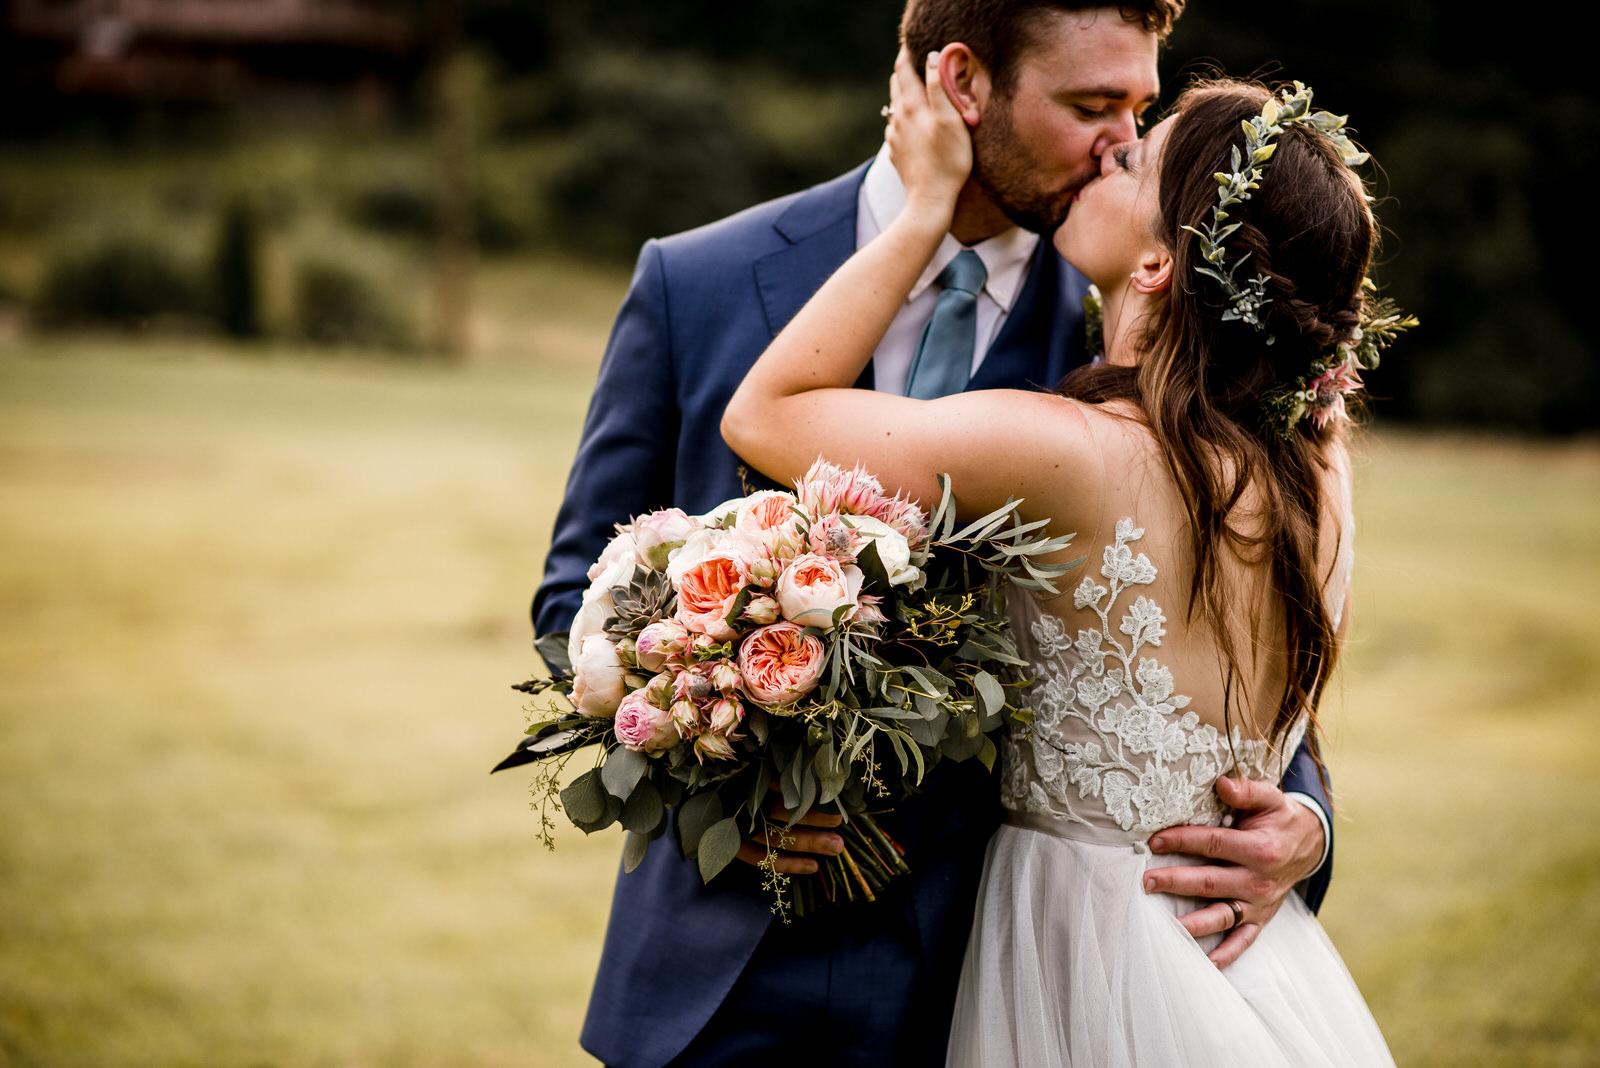 dreamy midsummer wedding - FIELDS OF BLACKBERRY COVE | WEAVERVILLE NC